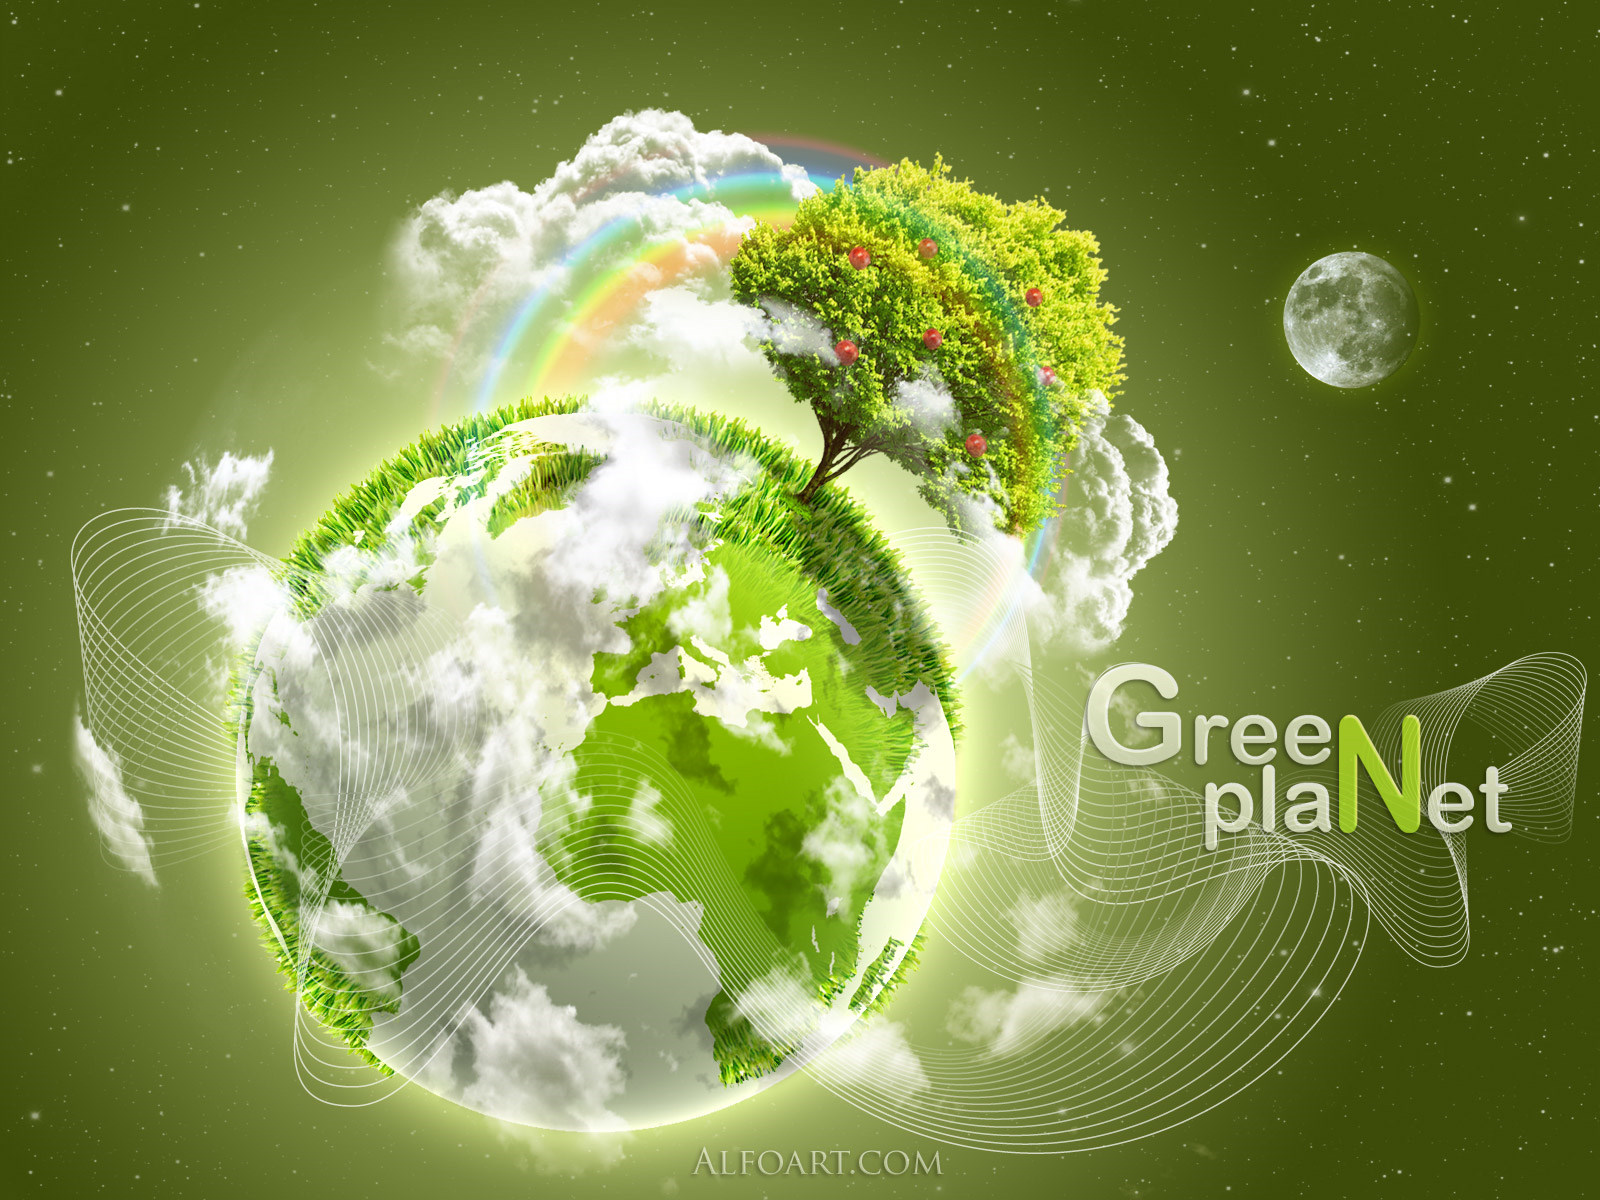 http://3.bp.blogspot.com/-VkbtwkjLsC8/T5MpMbV_MwI/AAAAAAAAA-4/I5U0pdoHrG8/s1600/earthday_wallpapers_quotes_images_gogreen_environmental(www.picturespool.blogspot.com)_03.jpg